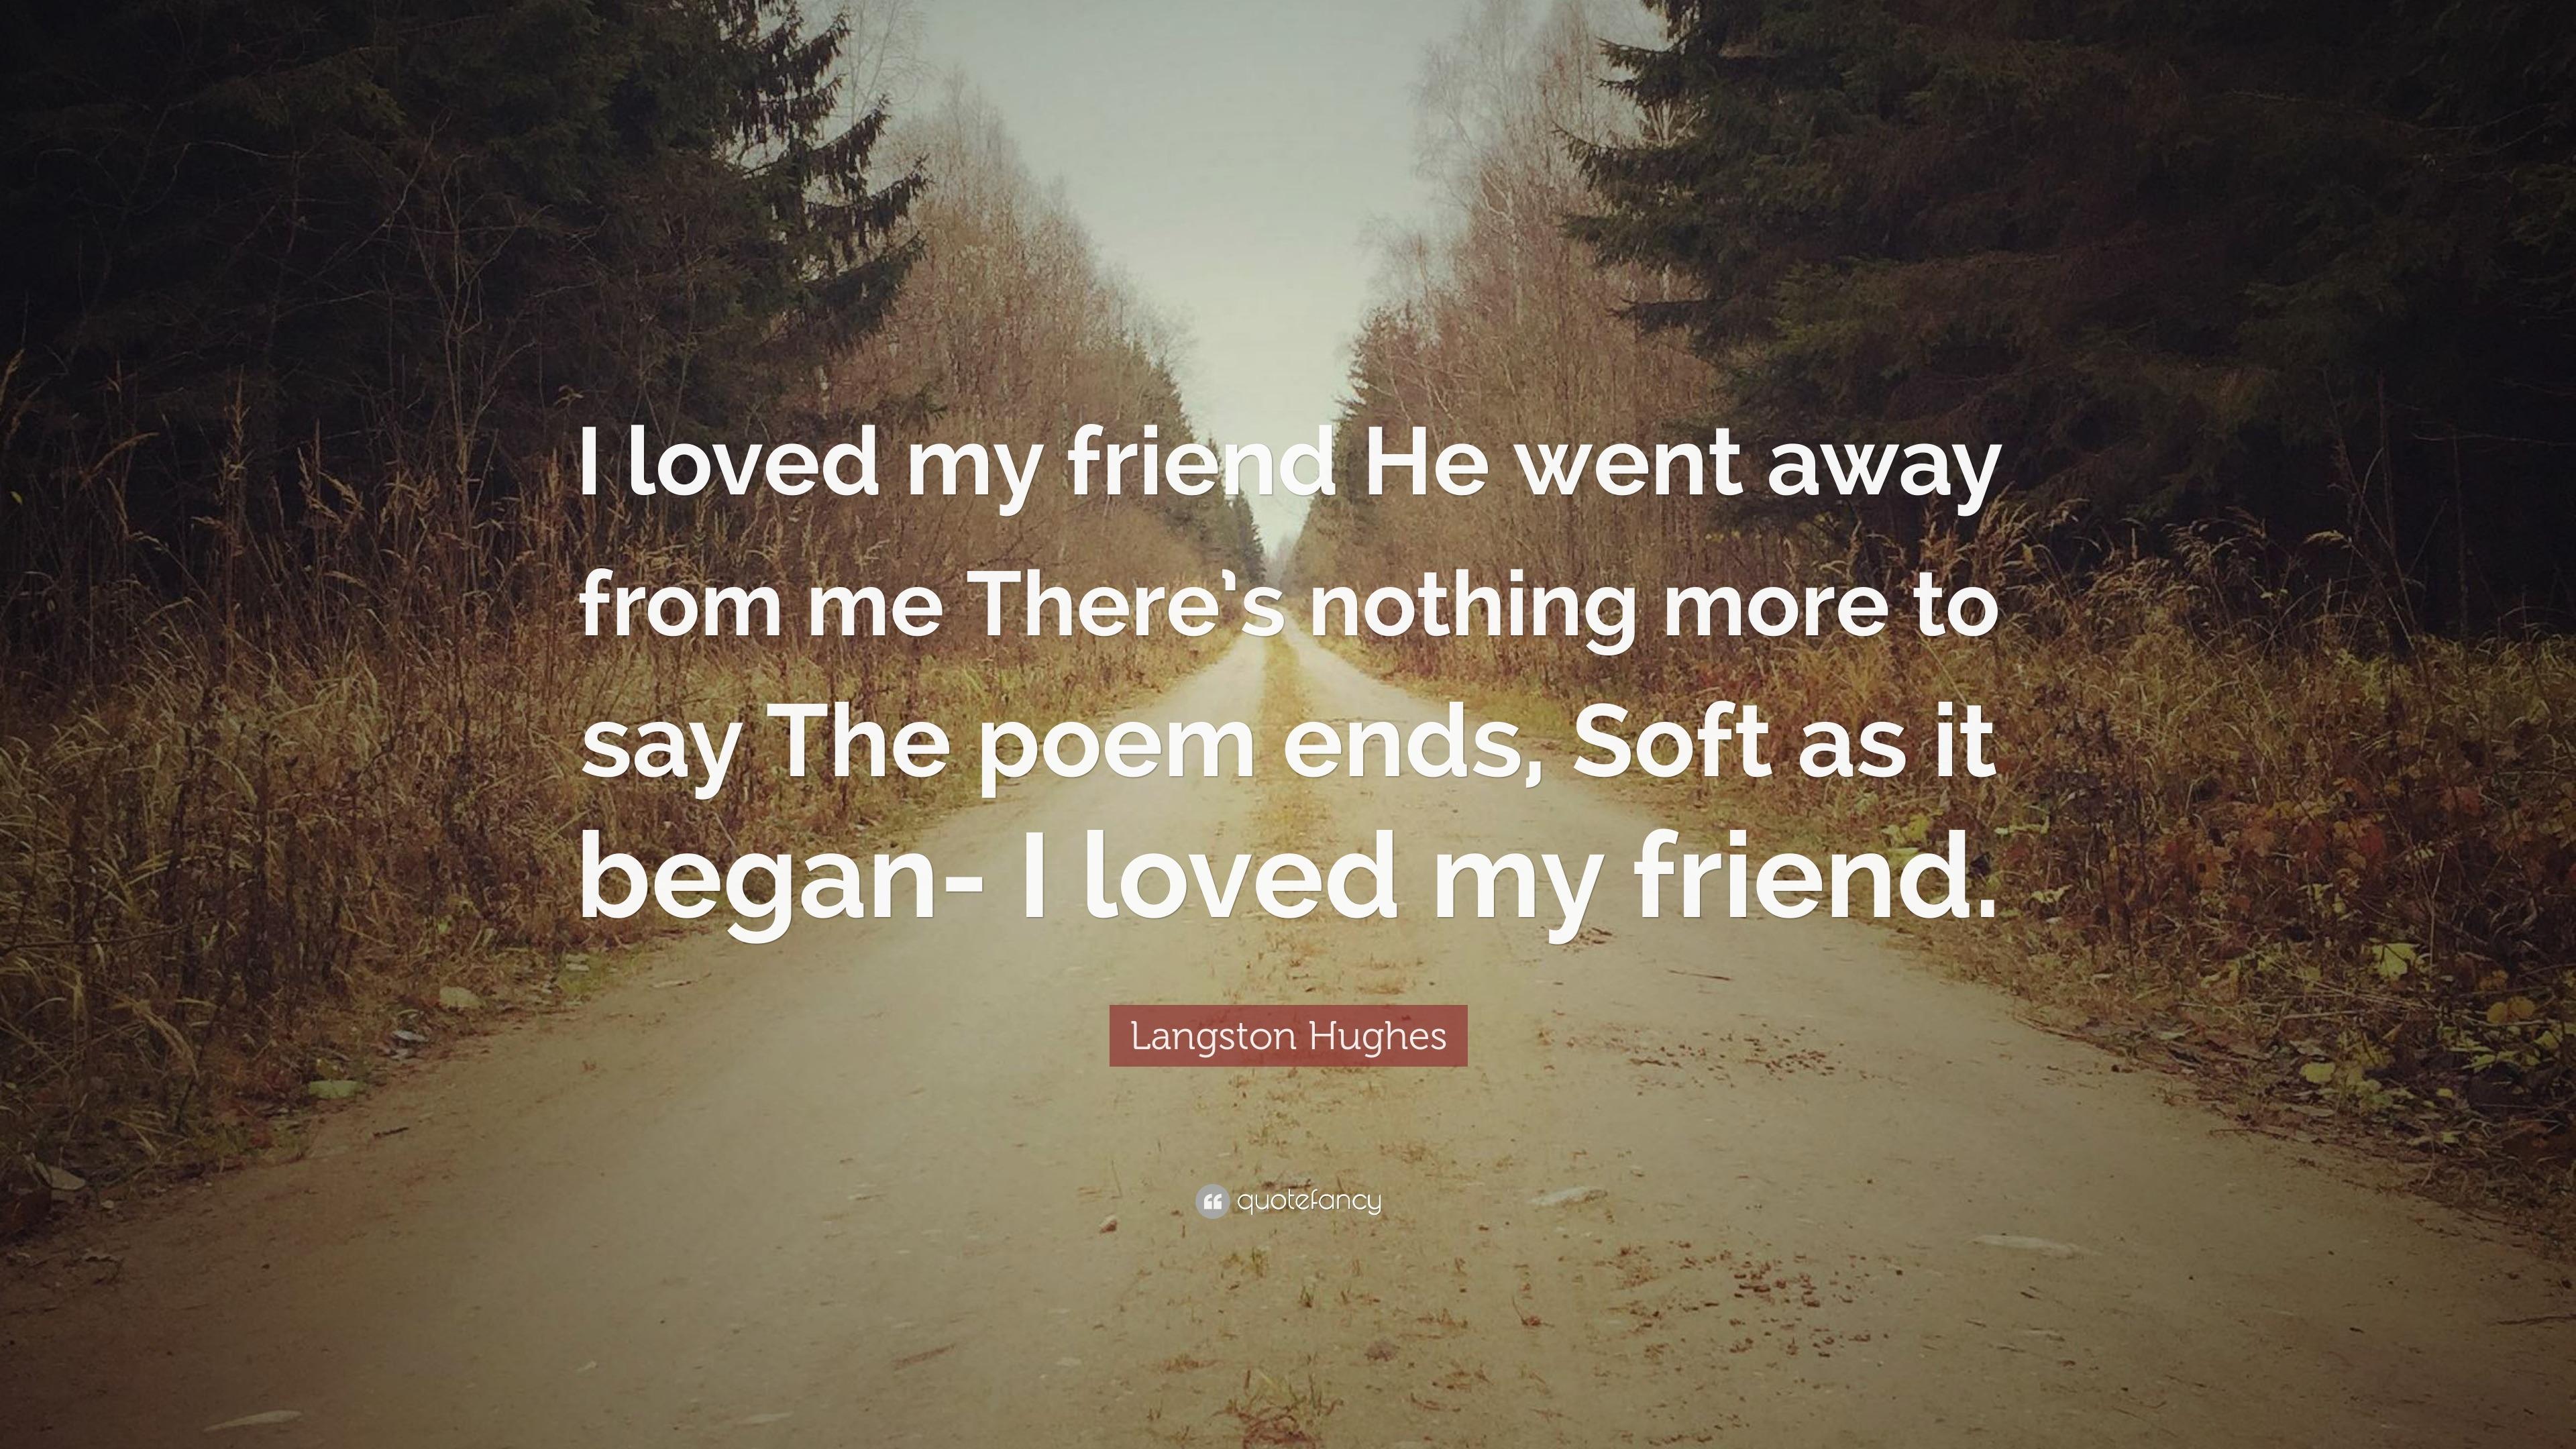 langston hughes poem end